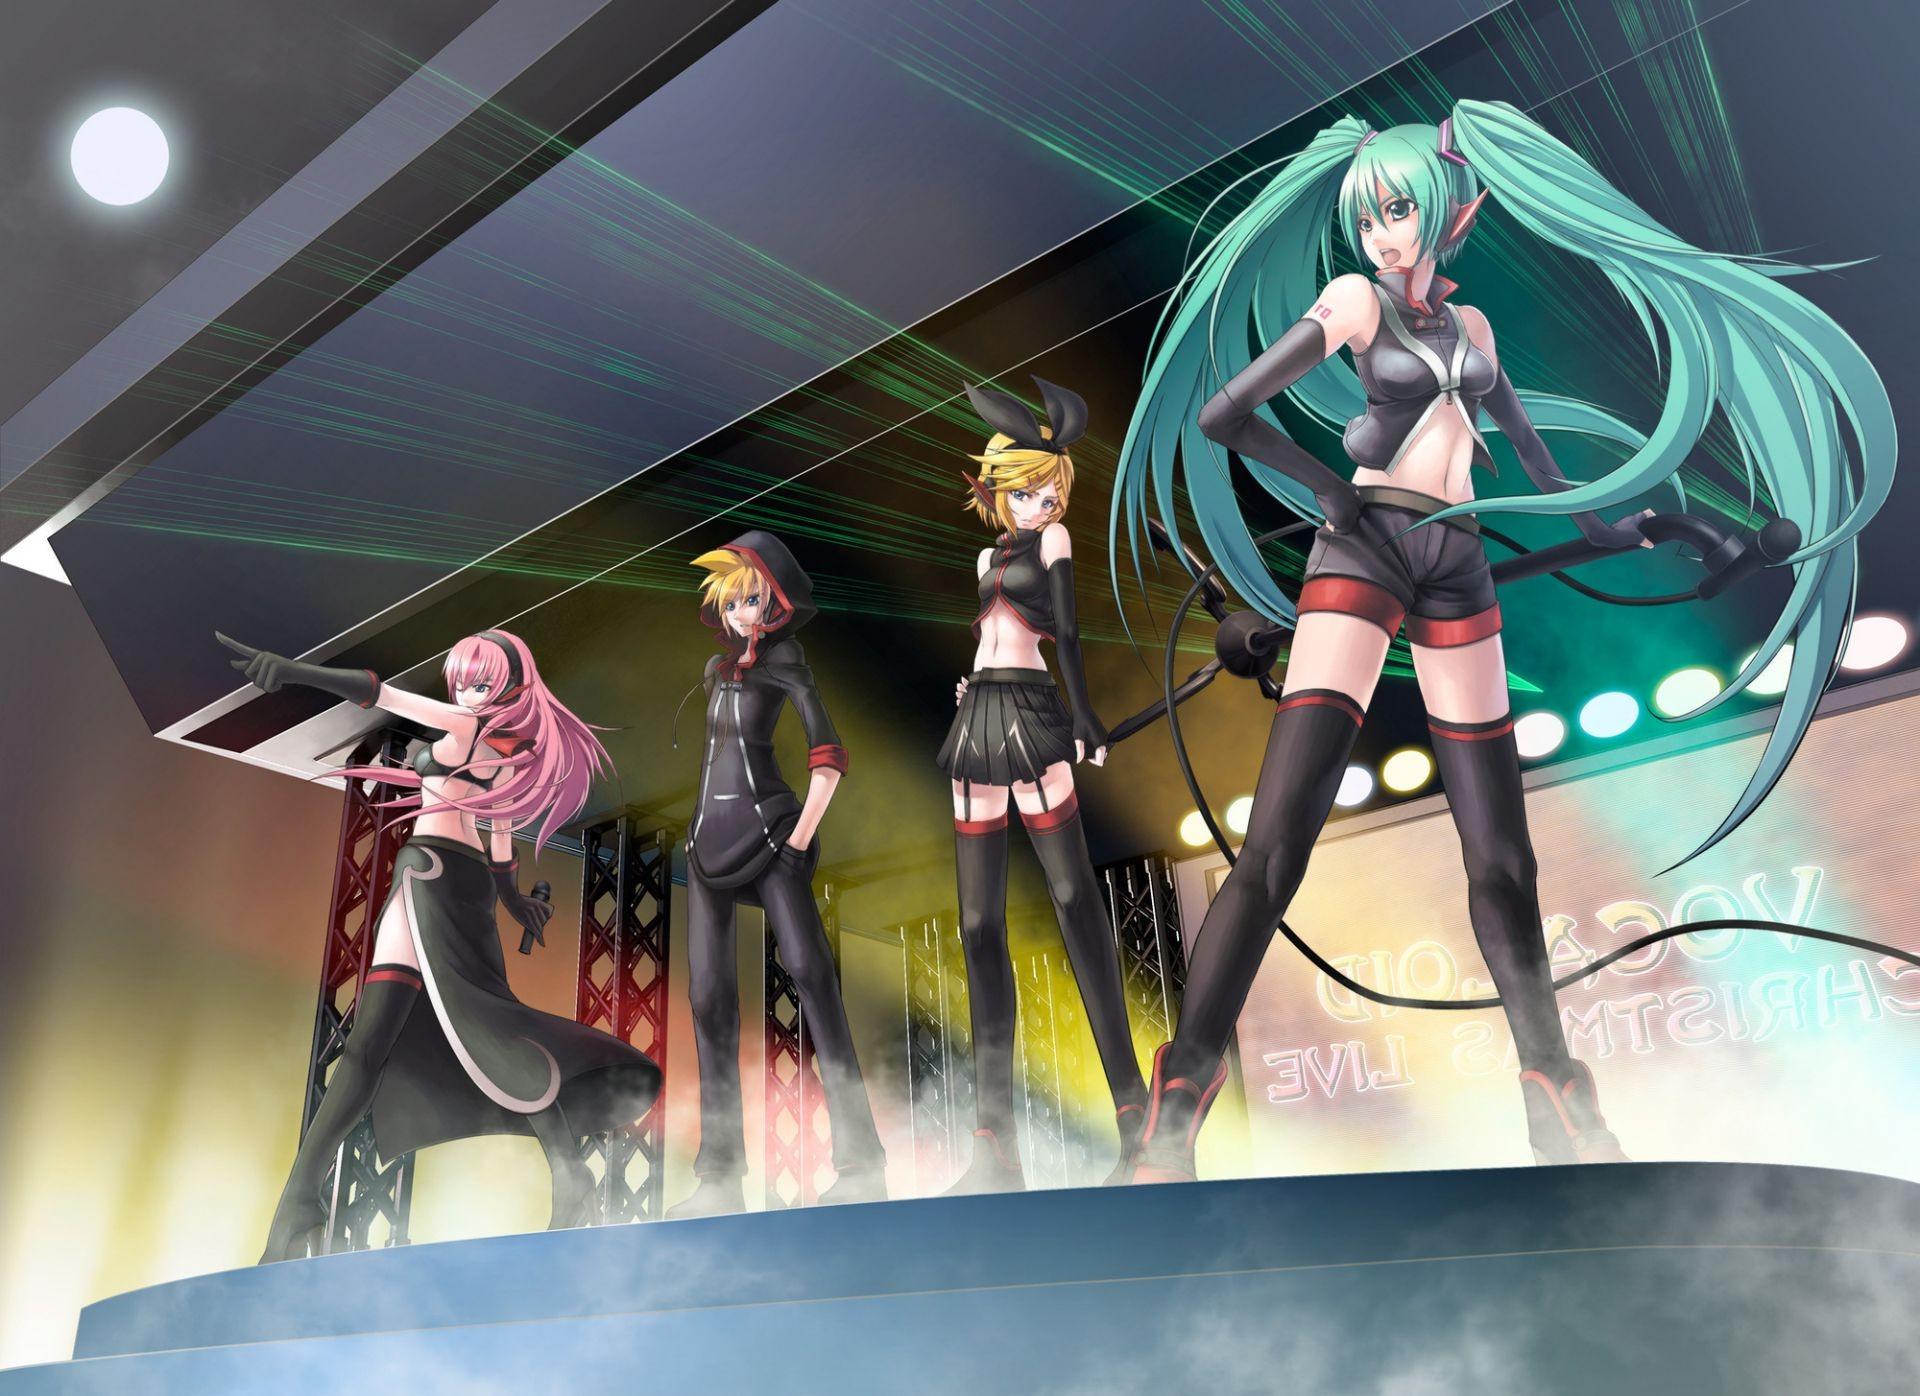 concert music vocaloid miku luka rin len song anime. android